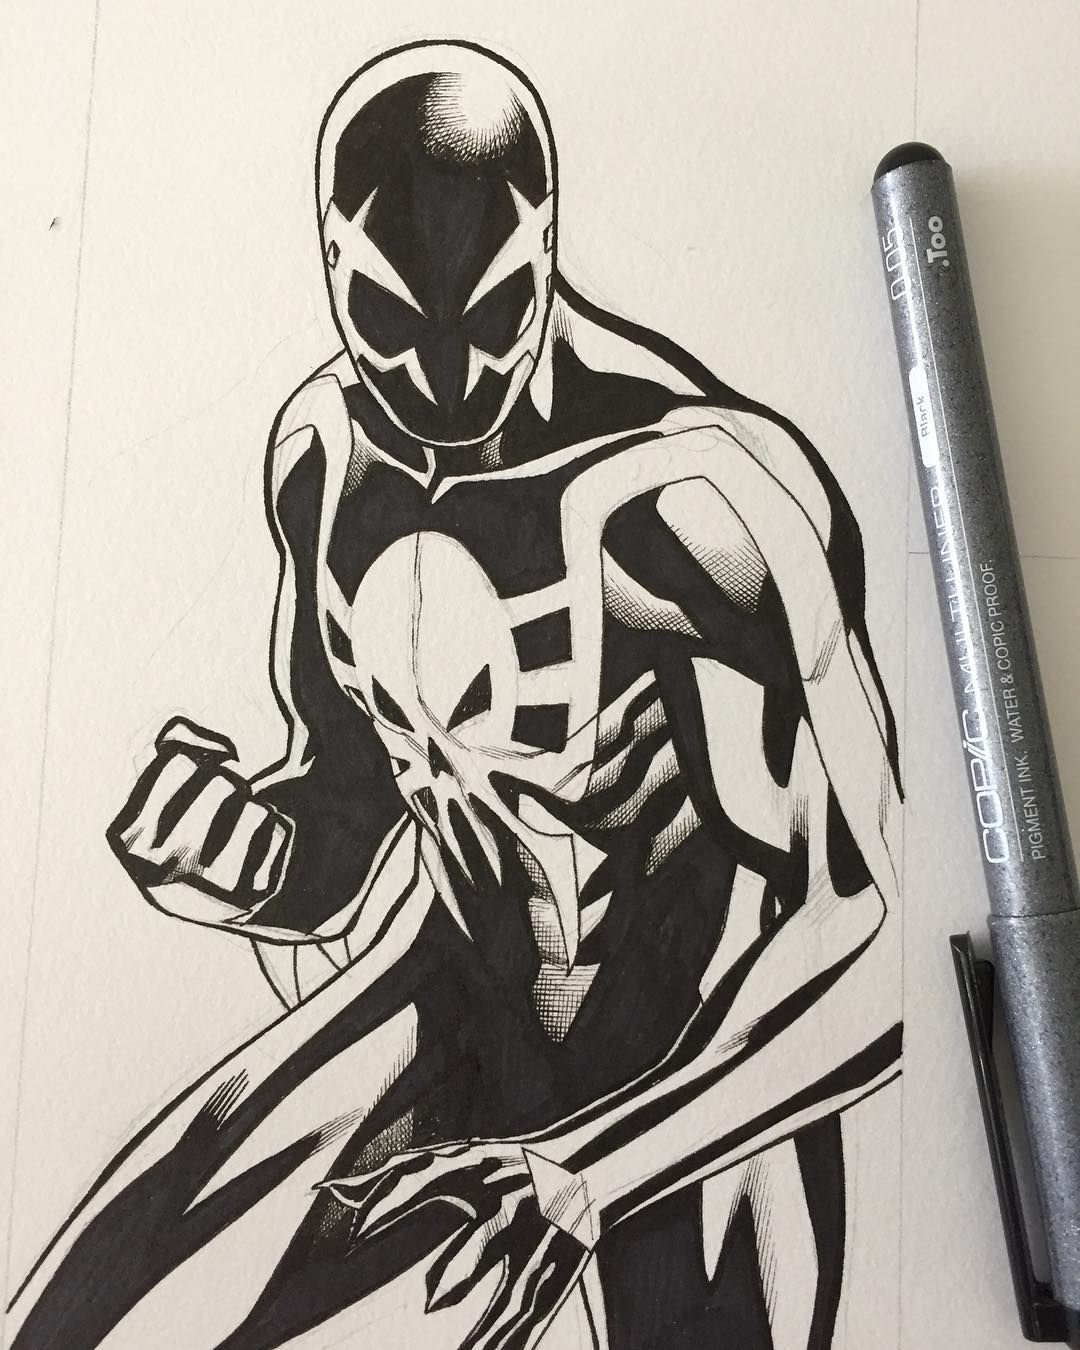 Imagen Relacionada Spiderman Artwork Marvel Superhero Posters Spiderman Drawing